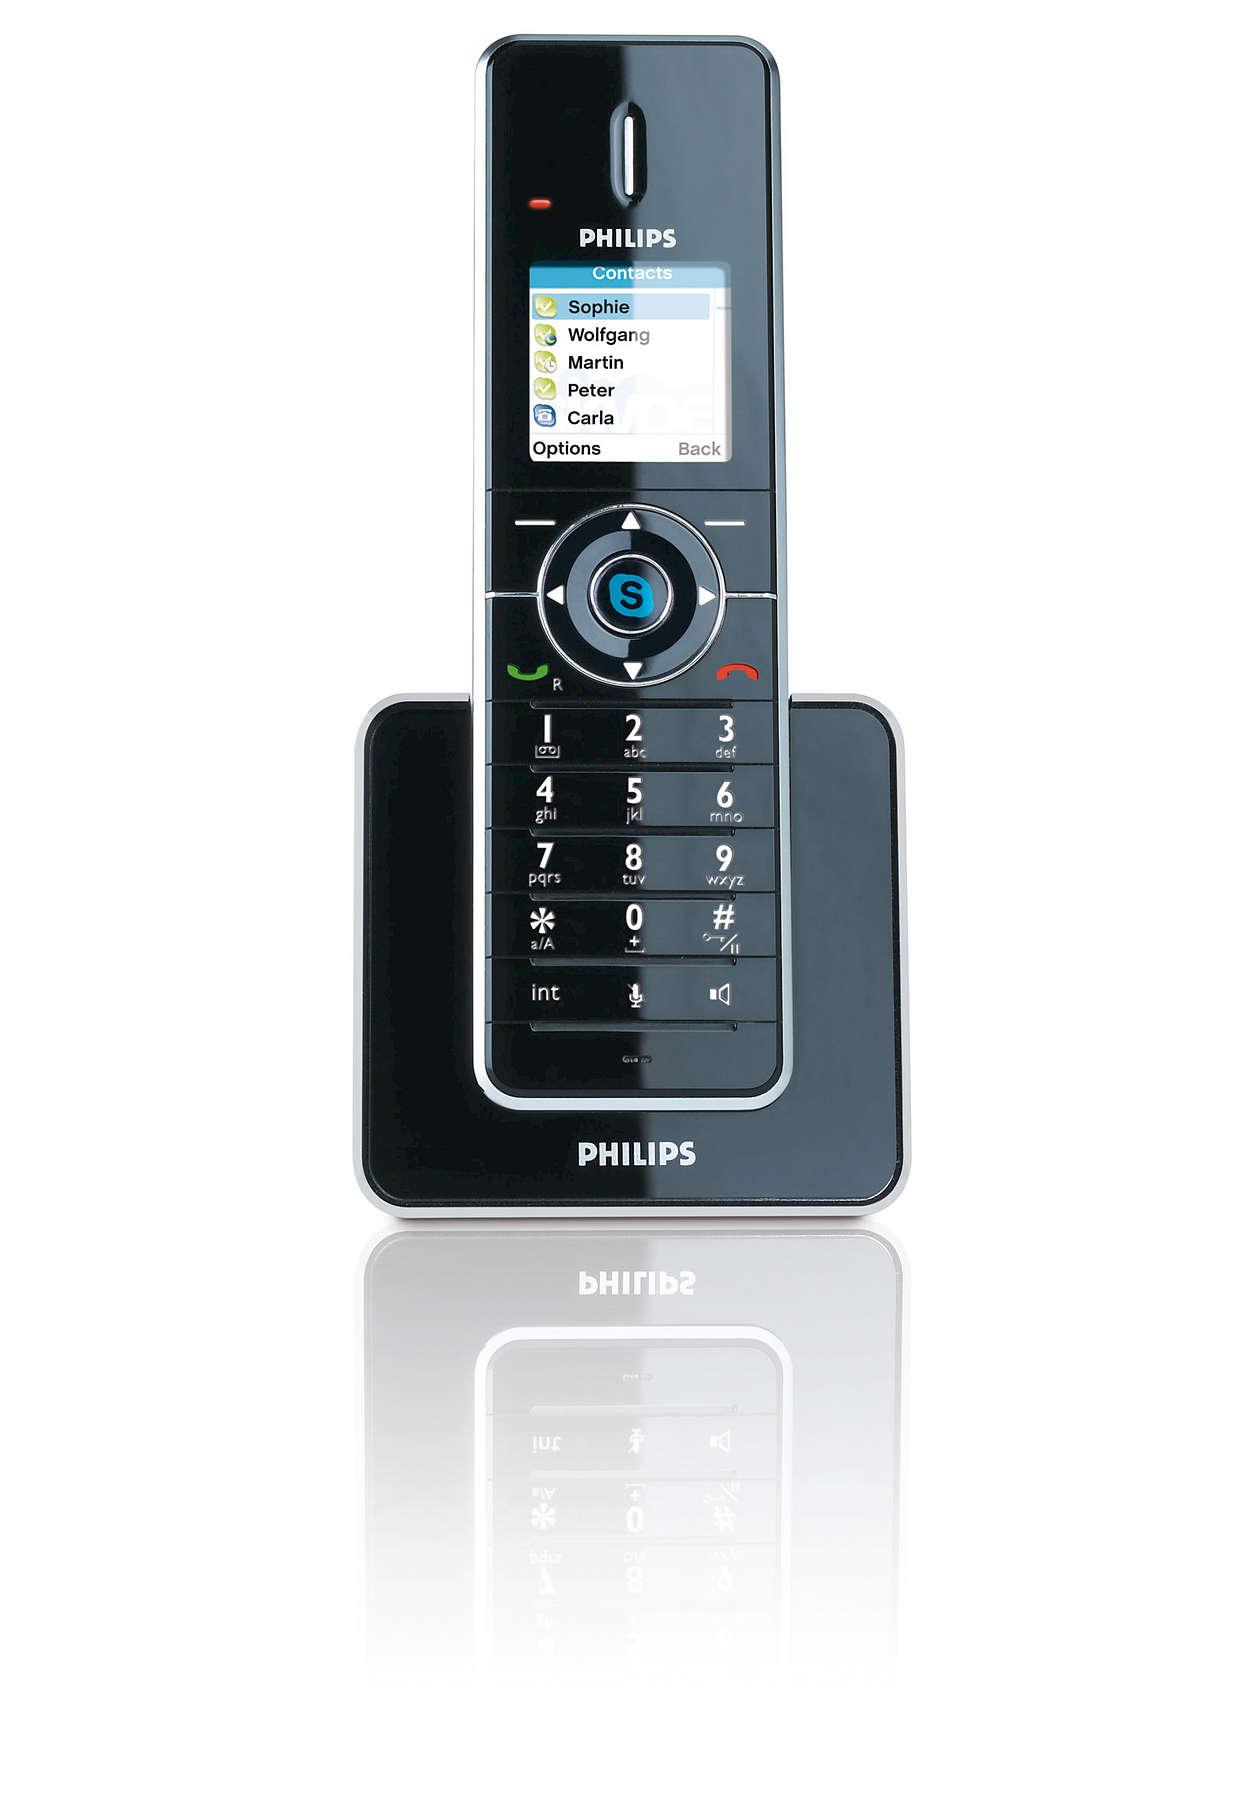 Foretag nemt opkald via Skype™ og fastnet